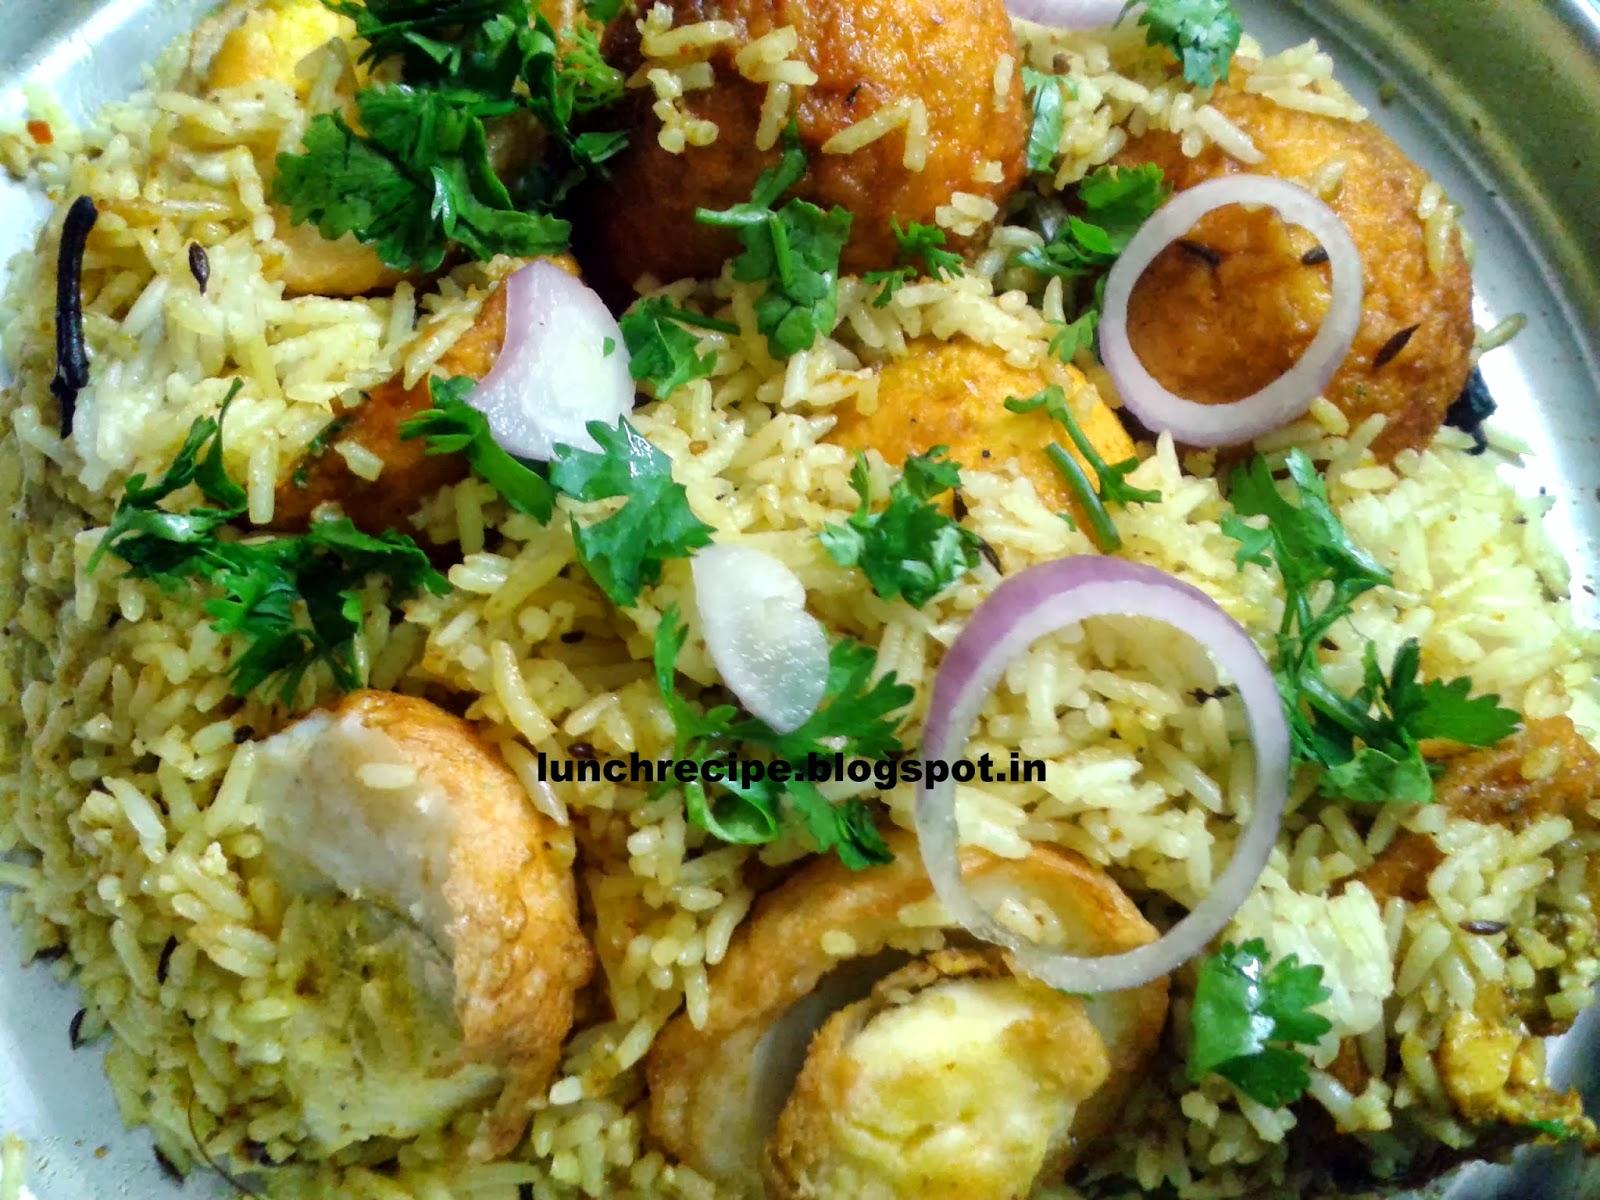 How to make Dimer Biryani  डीमेर बिरयानी  - Dimer Biryani  Egg Biryani